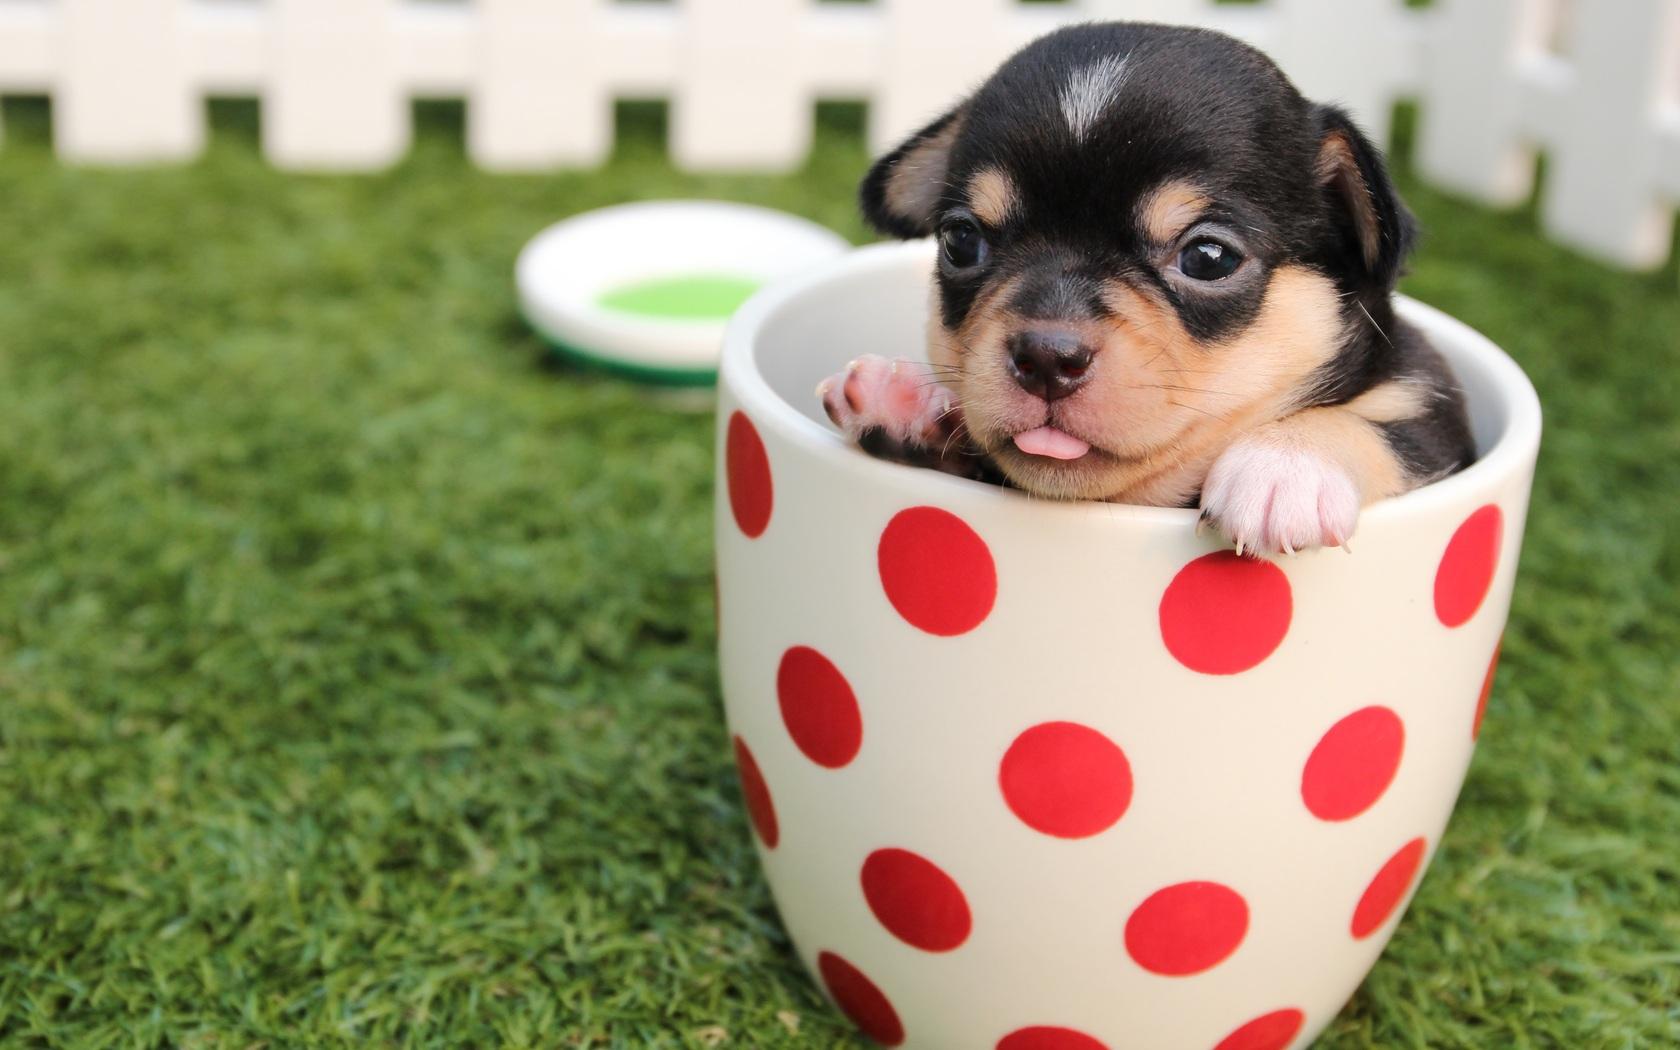 cute-dog-puppy-in-cup.jpg